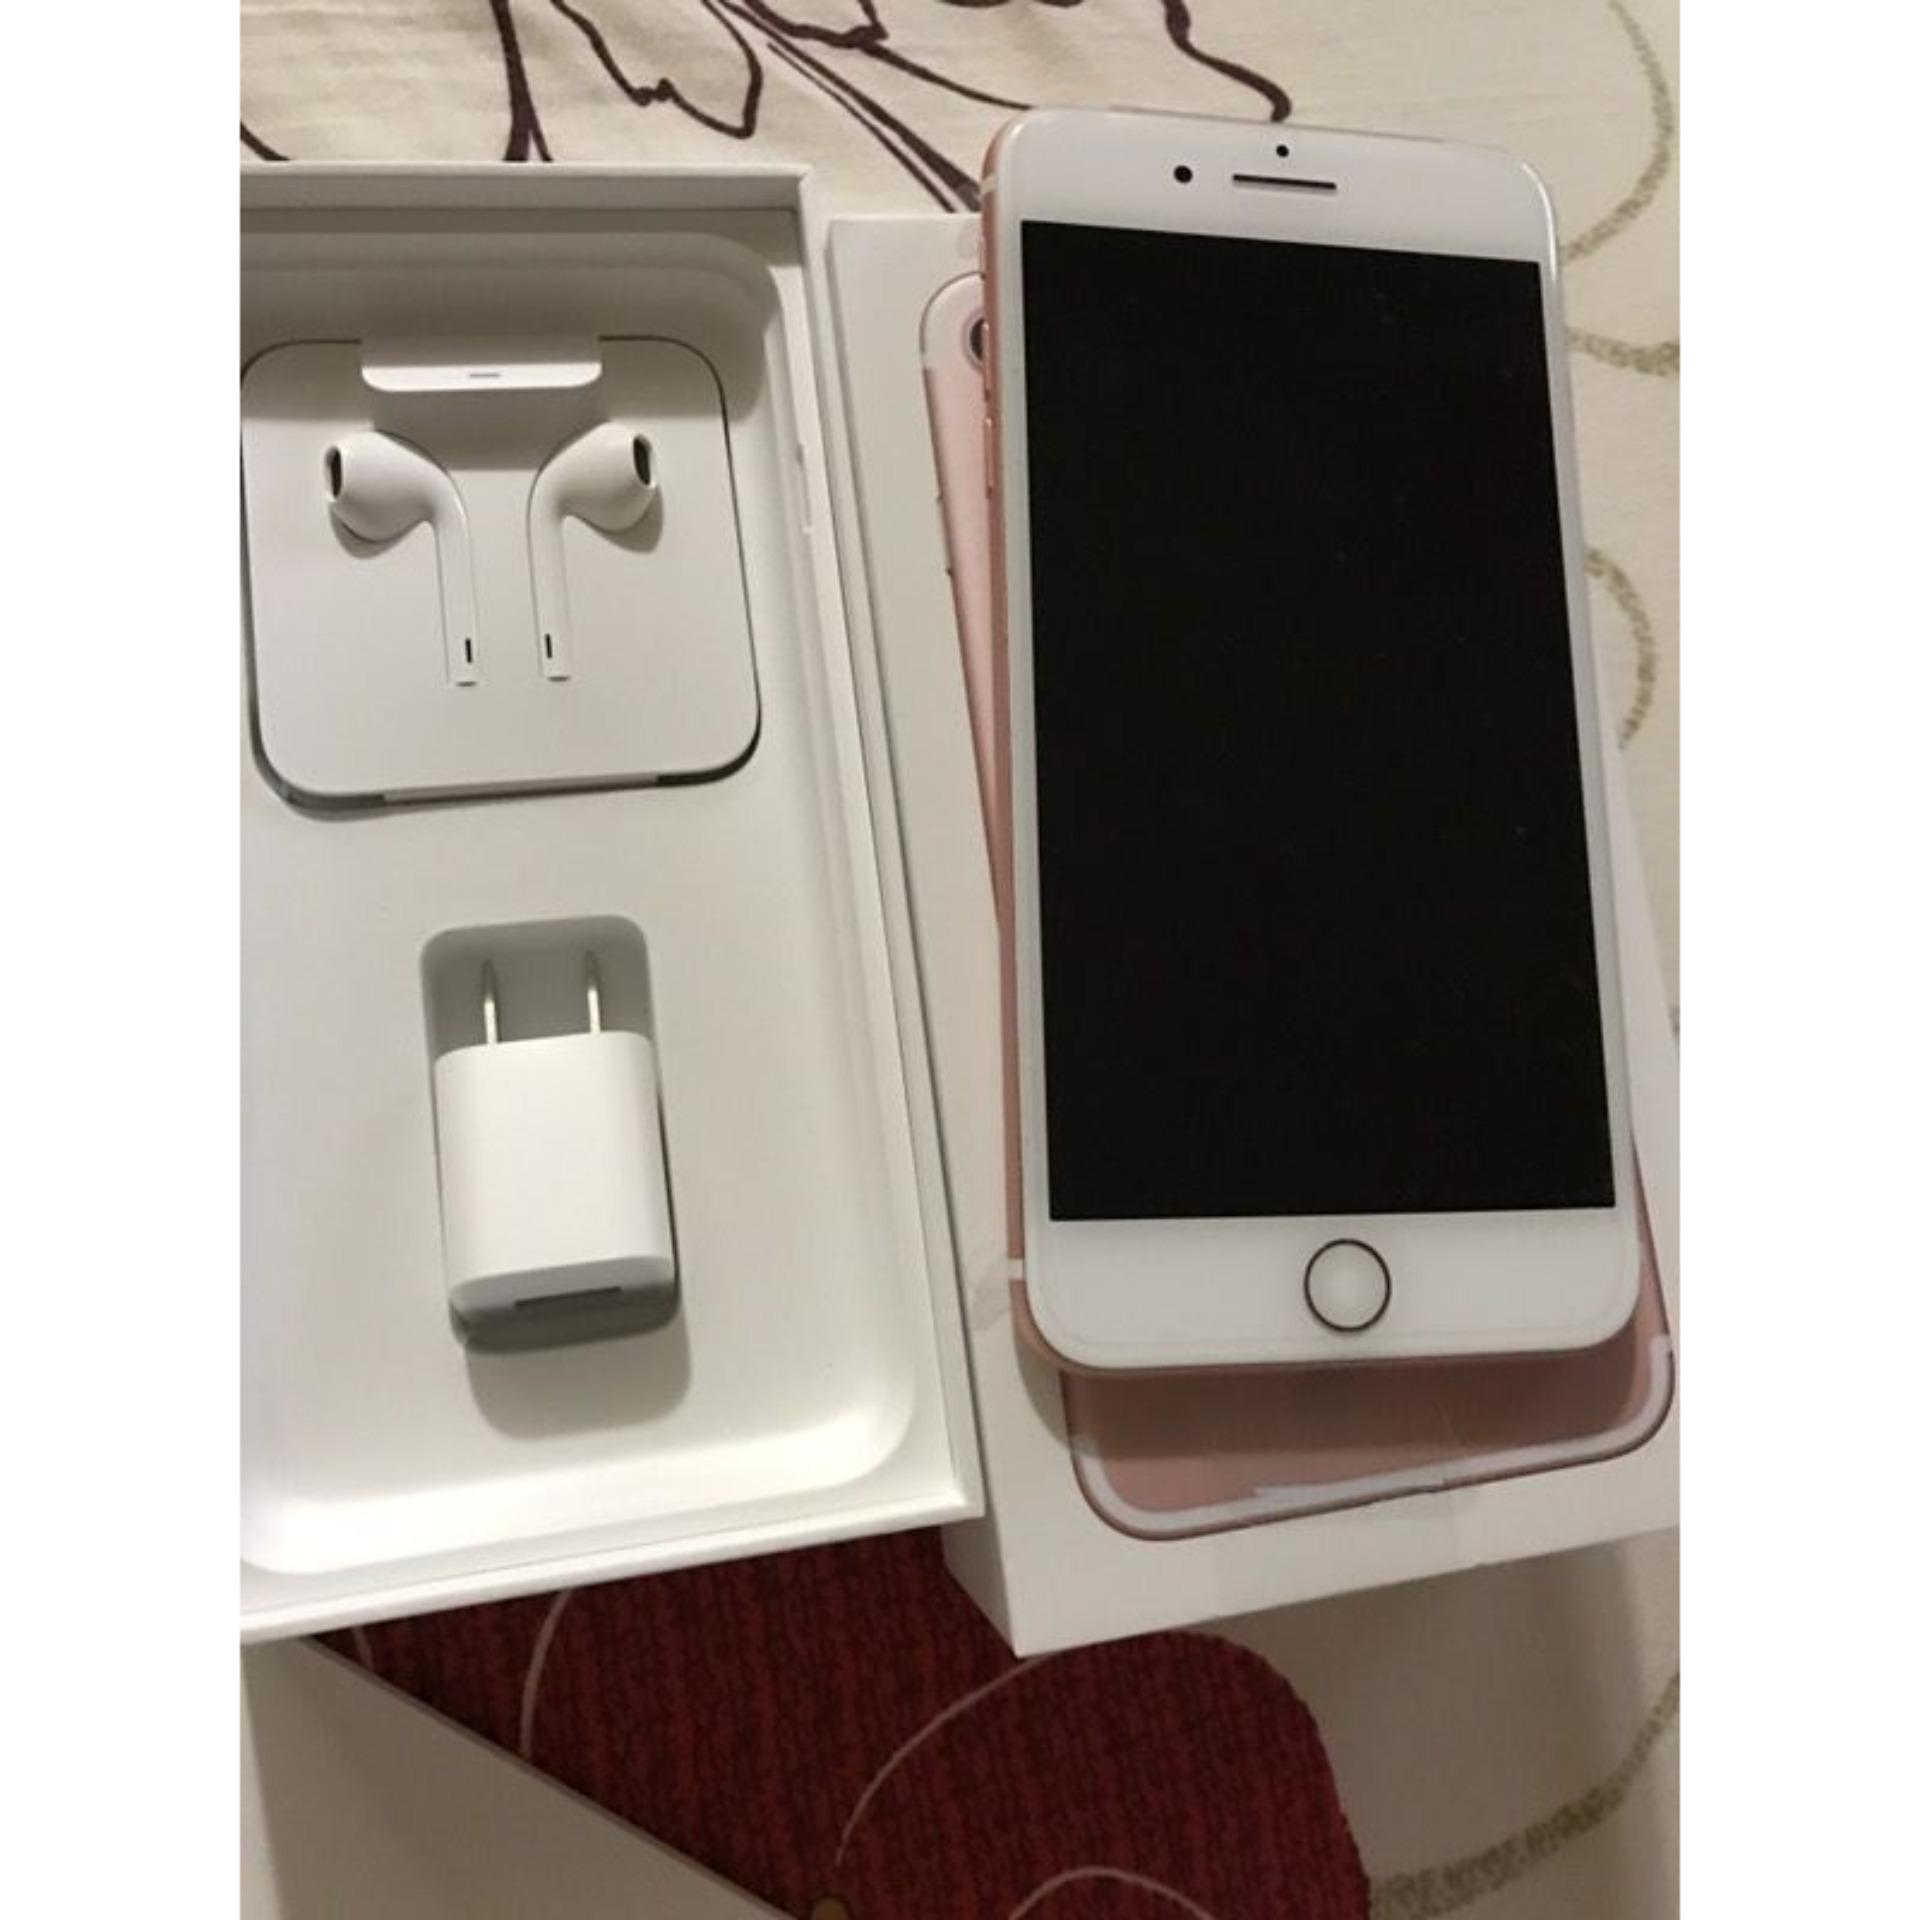 Apple Iphone 7 128gb Black Garansi Internasional 1 Tahun Daftar Hot Priceiphone Plus Bnib Fu Ori Rosegold Ram 3gb Camera 12mp